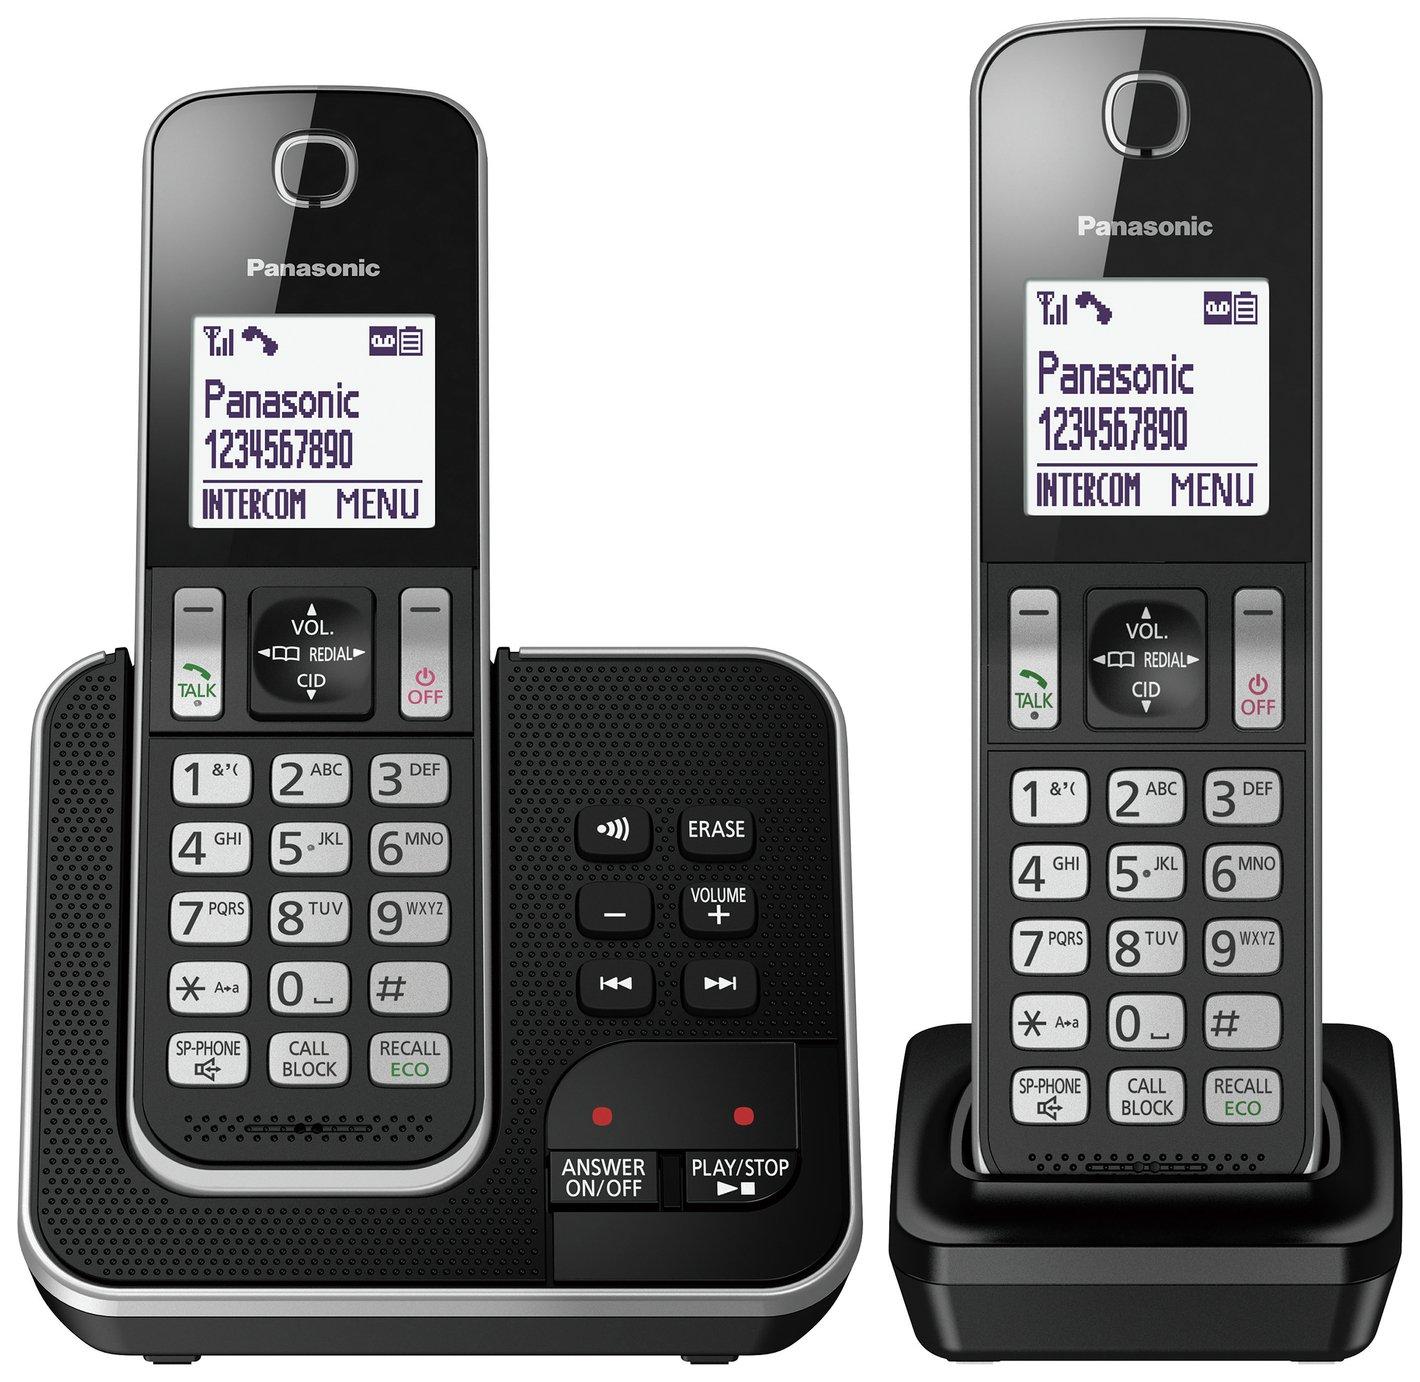 Panasonic Cordless Telephone with Answering Machine - Twin